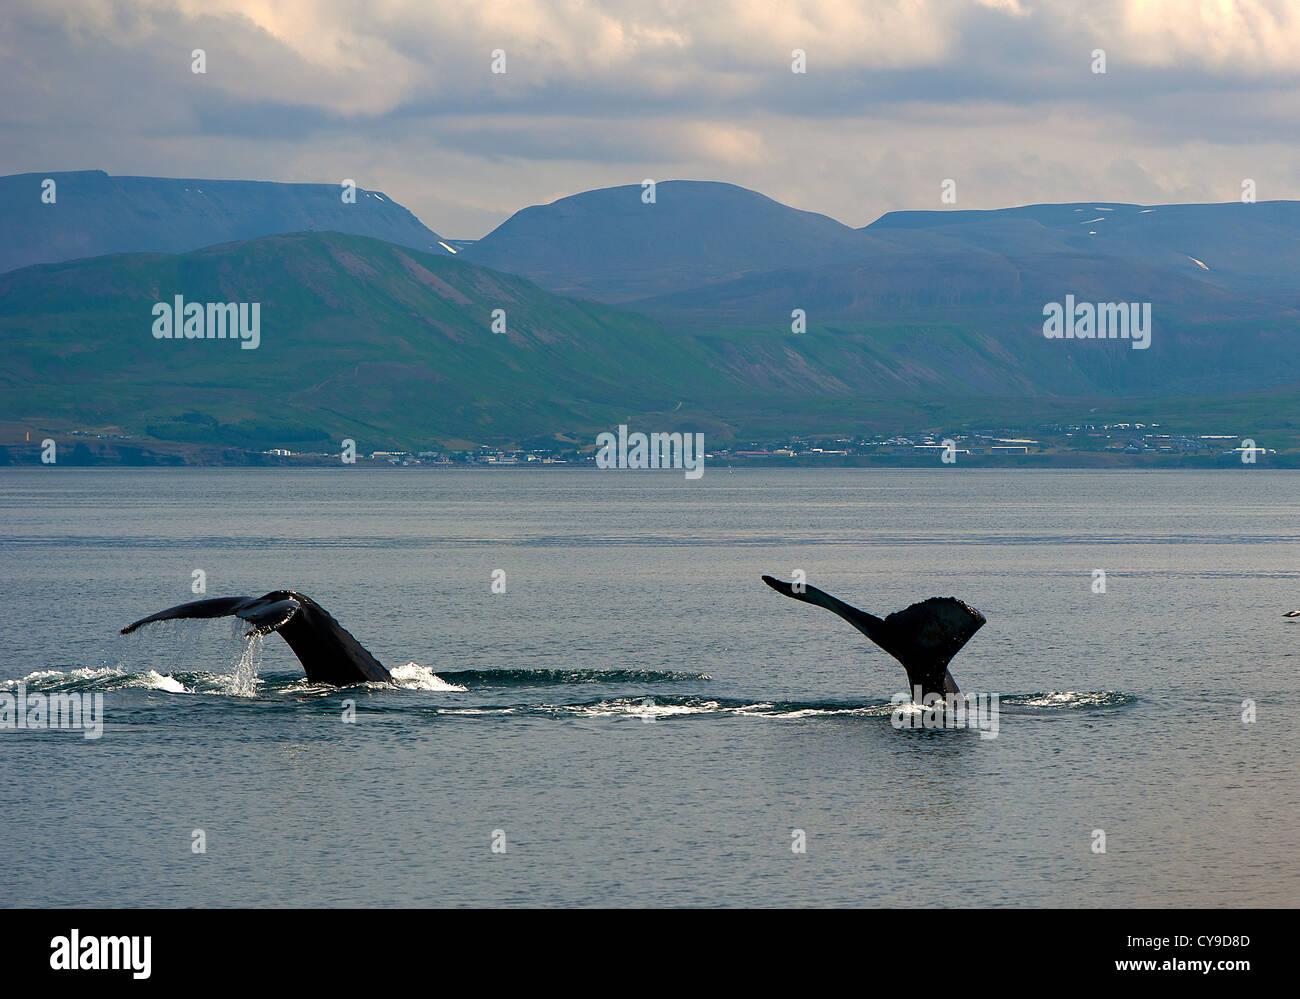 Couple of Whale's tails, Husavik Iceland - Stock Image